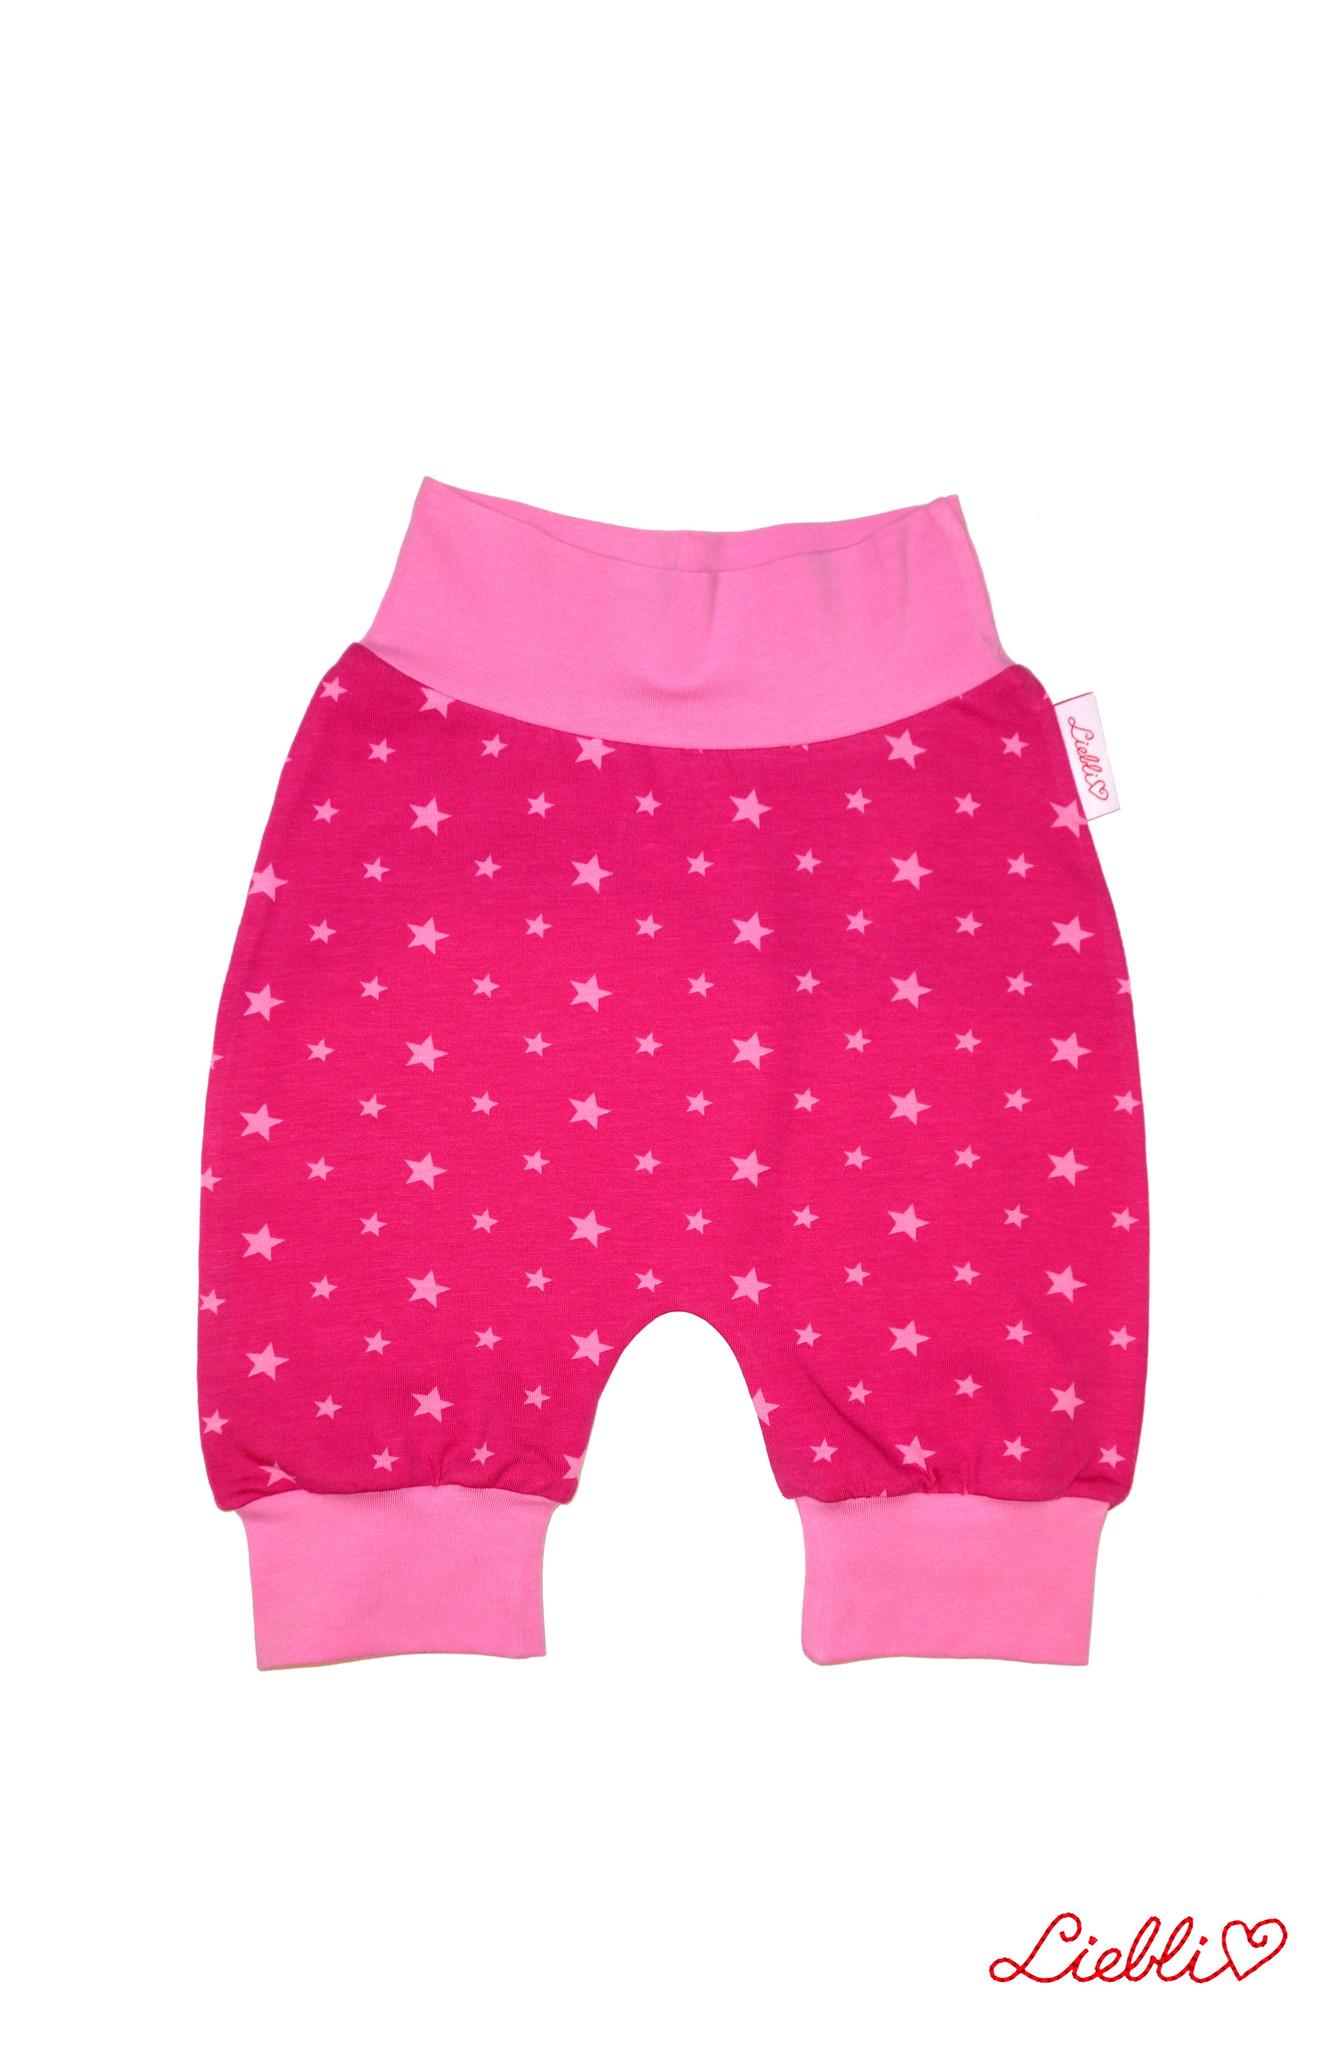 Babyhose / Pumphose, Sternchen pink rosa